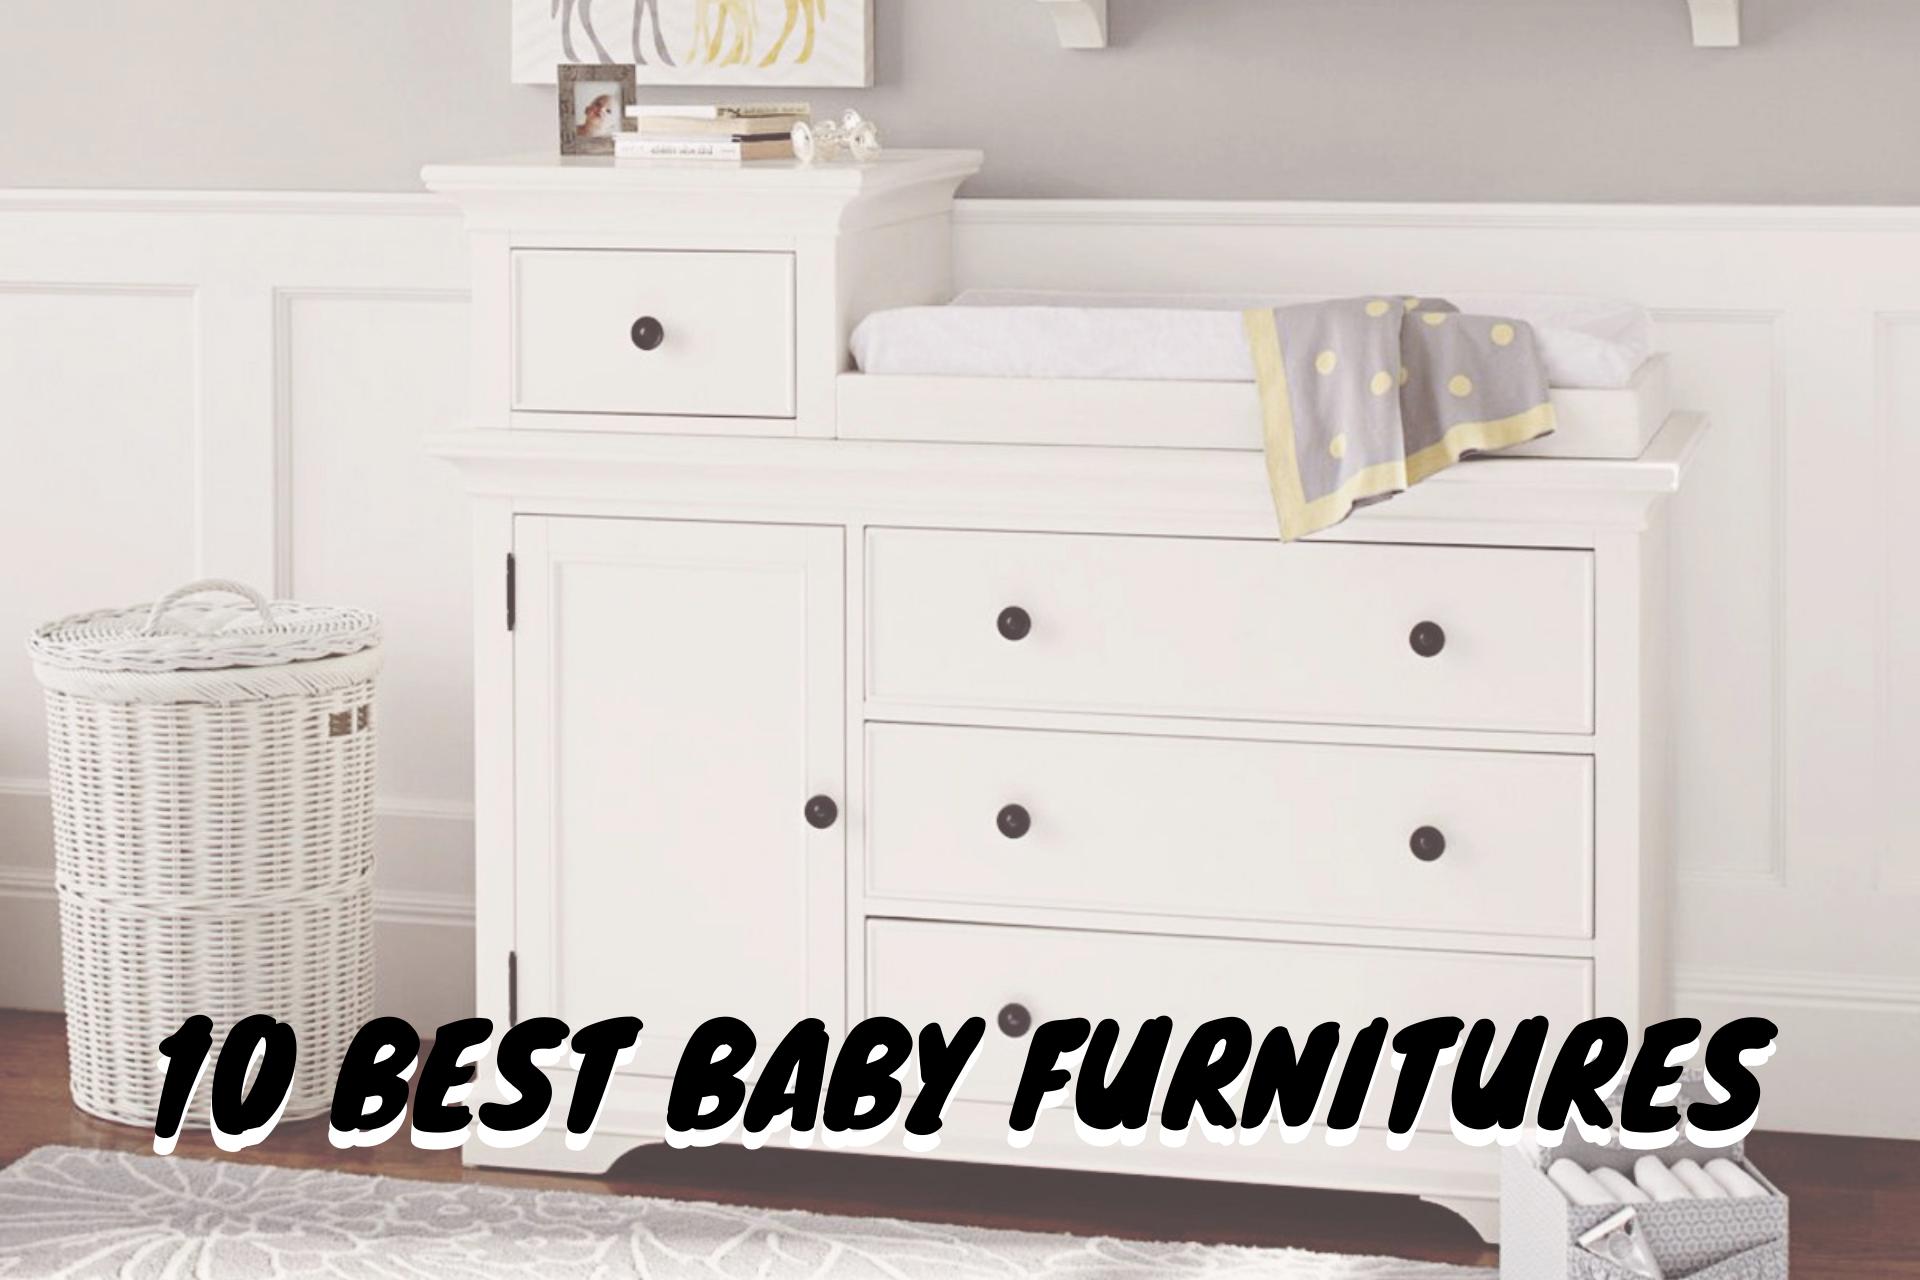 10 BEST BABY FURNITURES